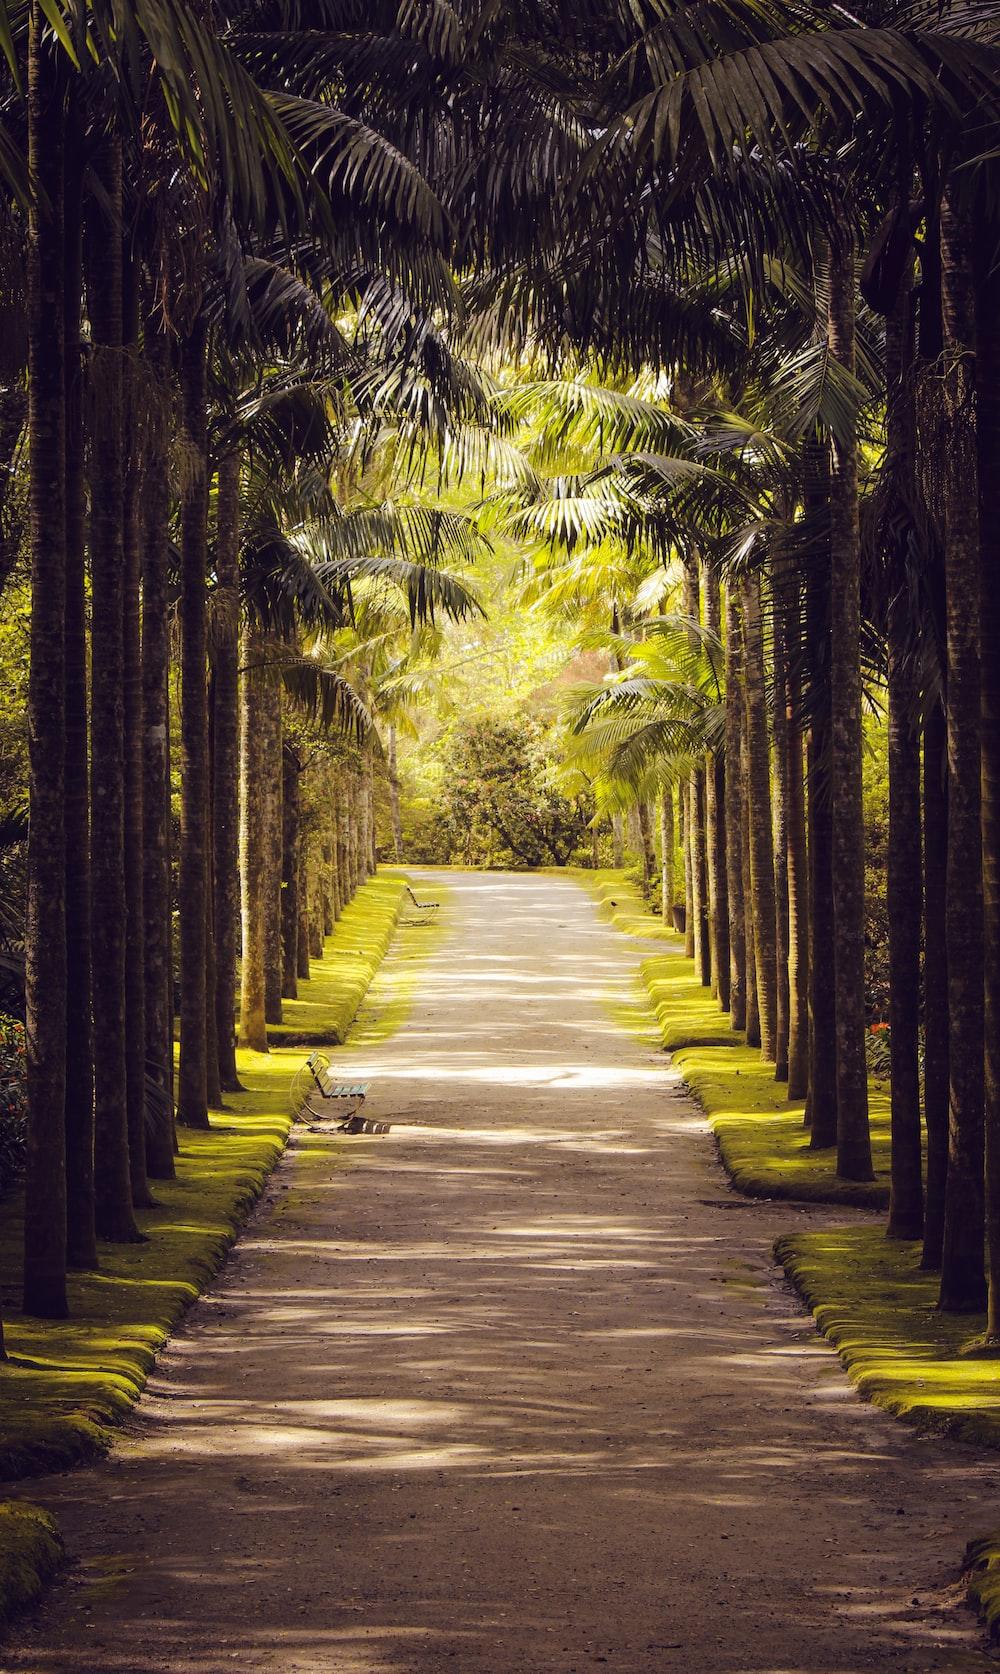 coconut palm tree tunnel